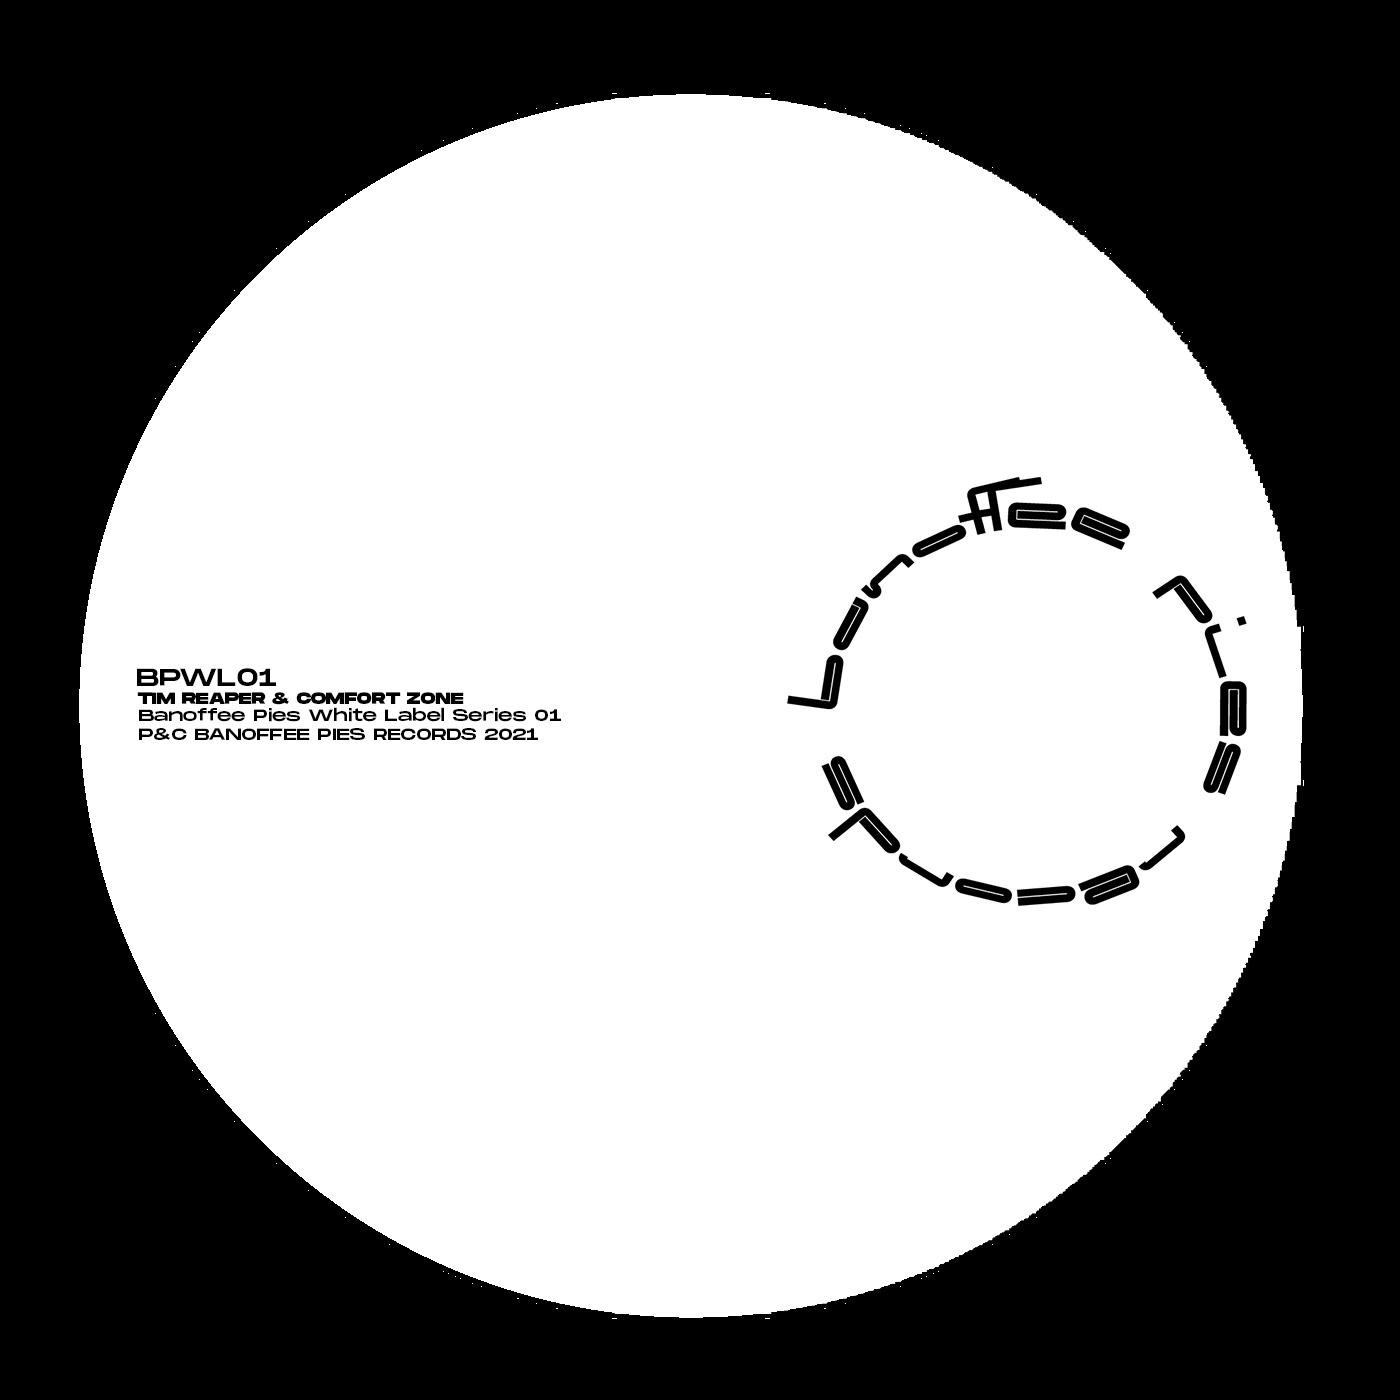 Tim Reaper & Comfort Zone – Banoffee Pies White Label Series 01 (Banoffee Pies)